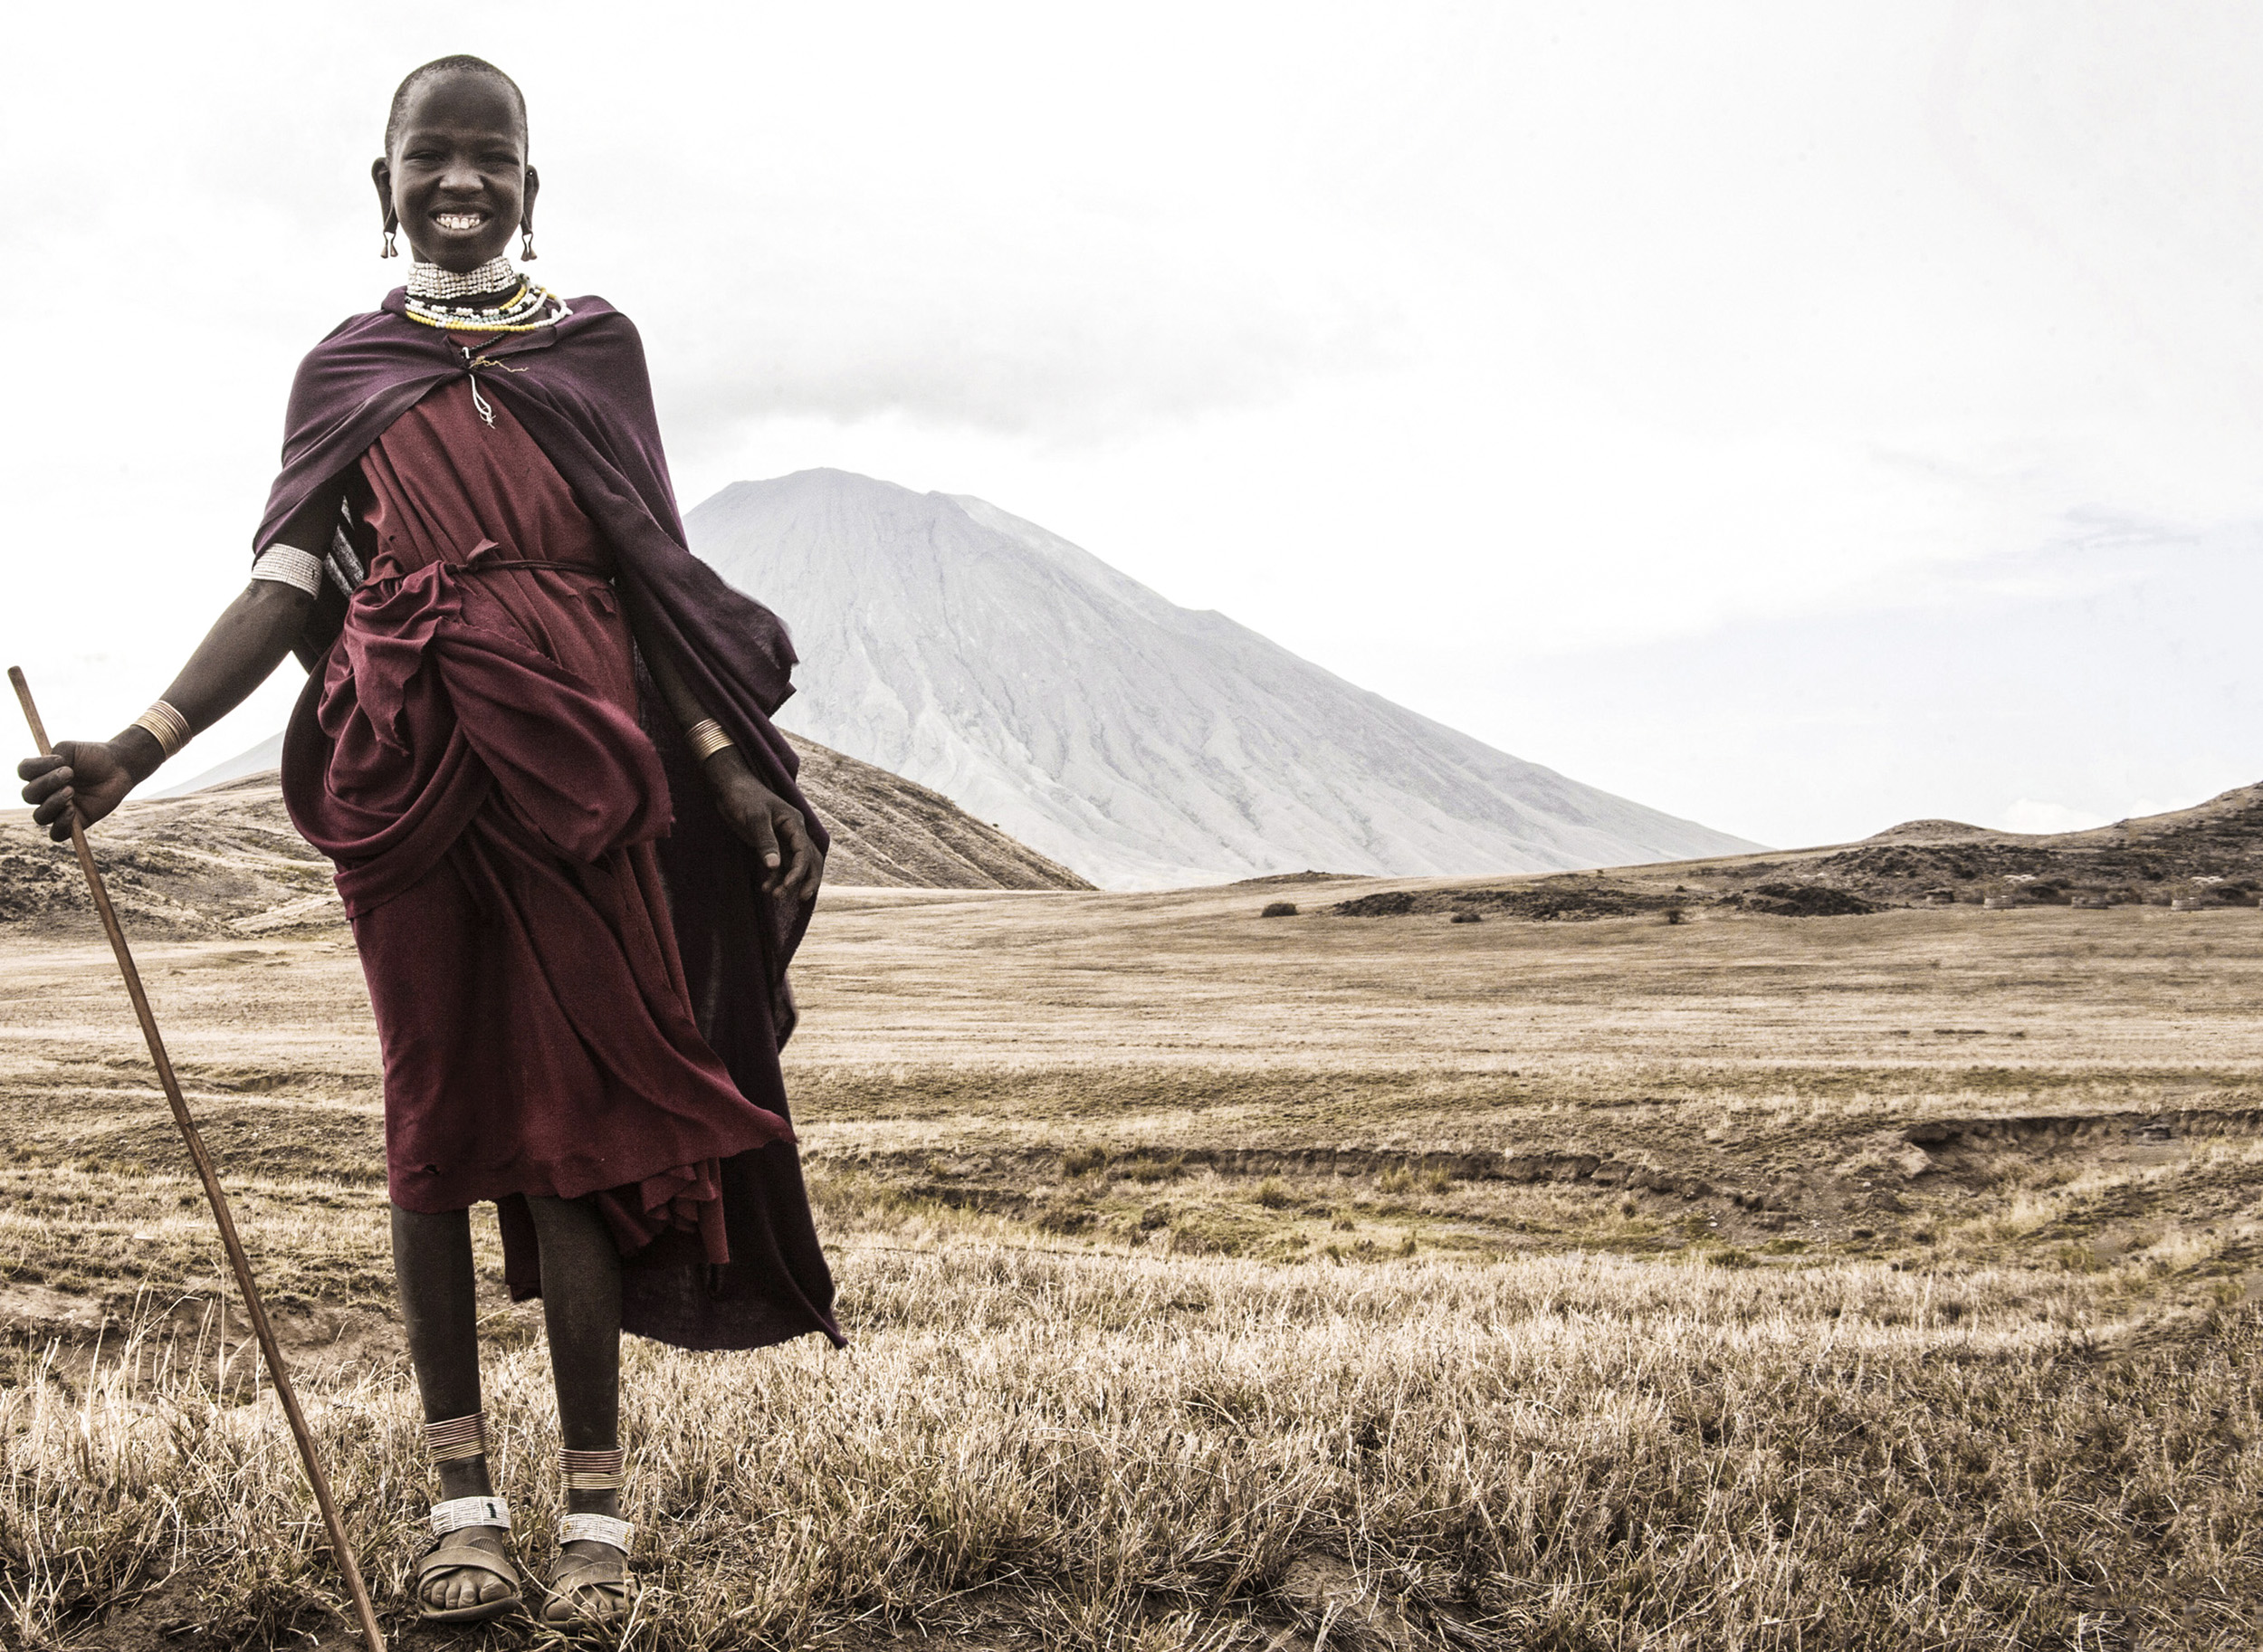 A Masai tribeswoman in Ol Donyoi Lengai, Tanzania, East Africa');